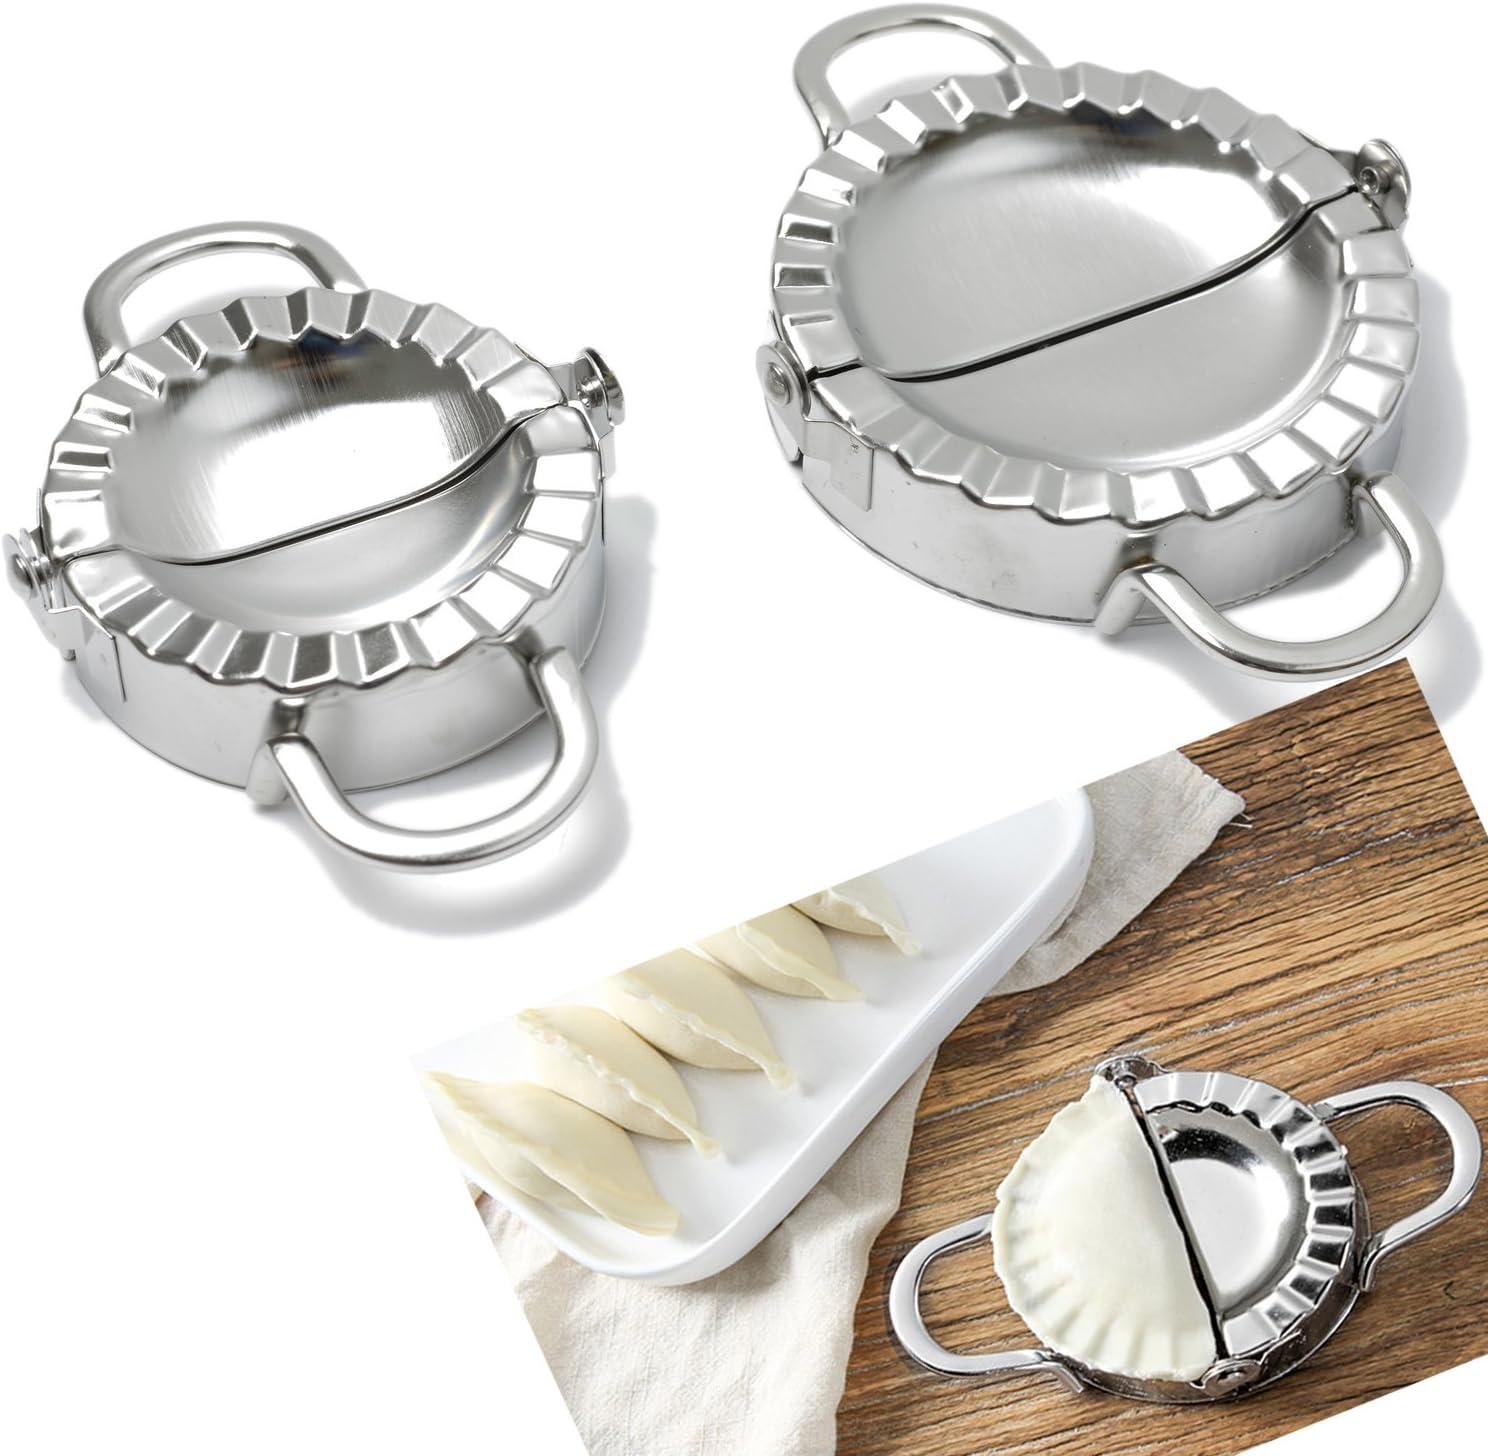 Dumpling Mould Press Meat Pie Pastry Maker Dough Cutter Tool Stainless Steel LB